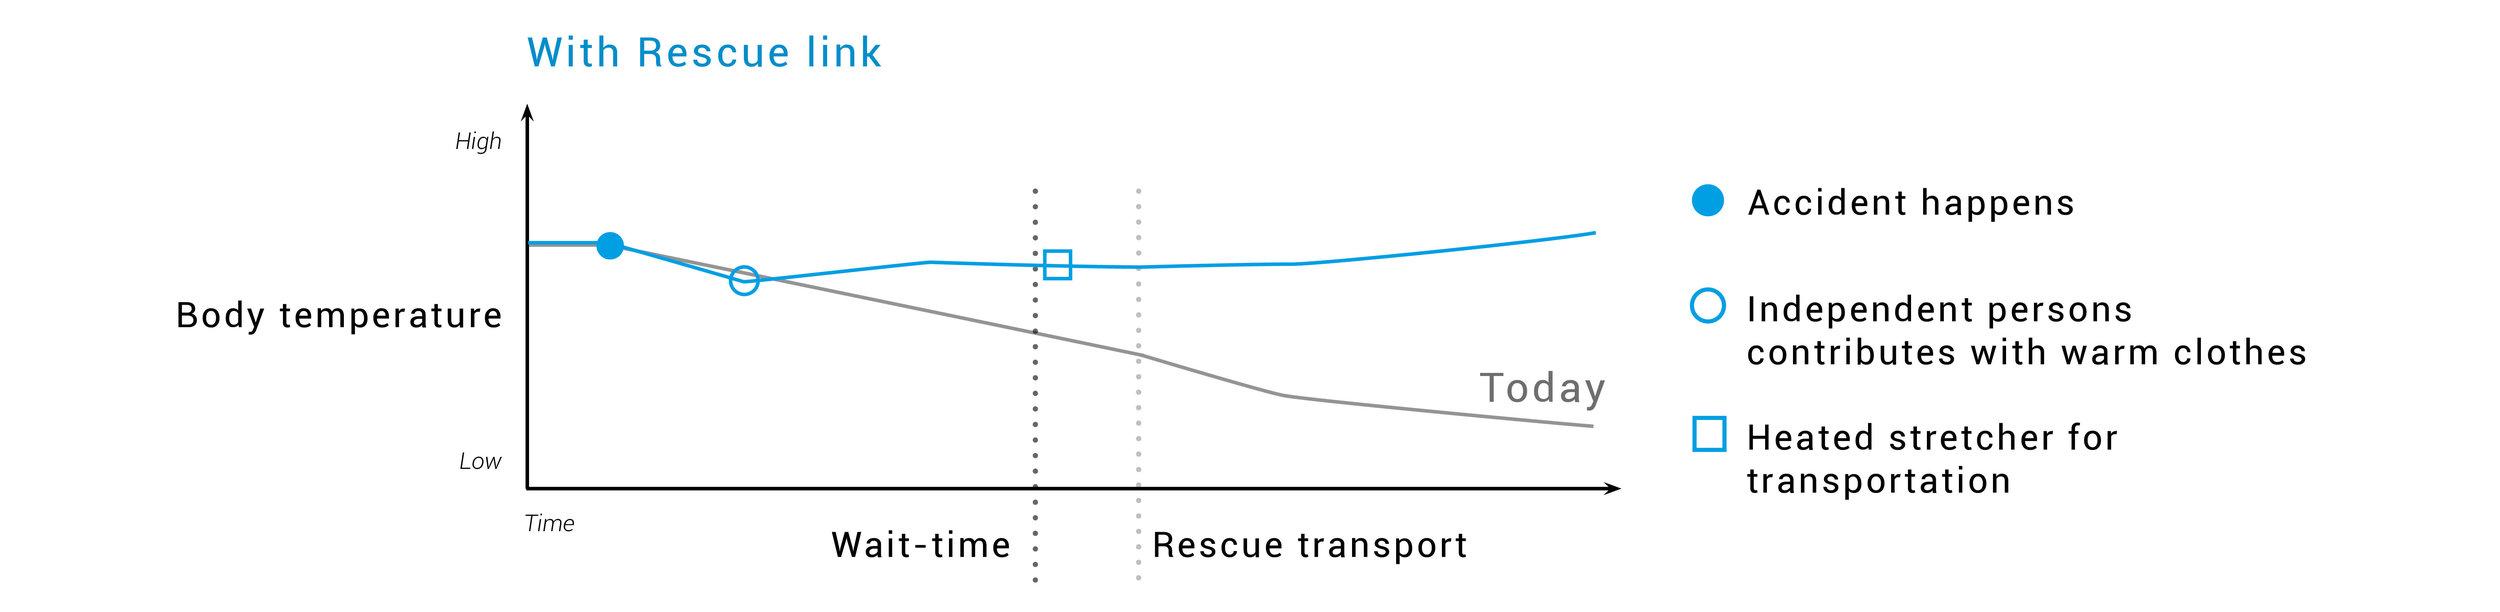 Rescue+link+graph.jpg